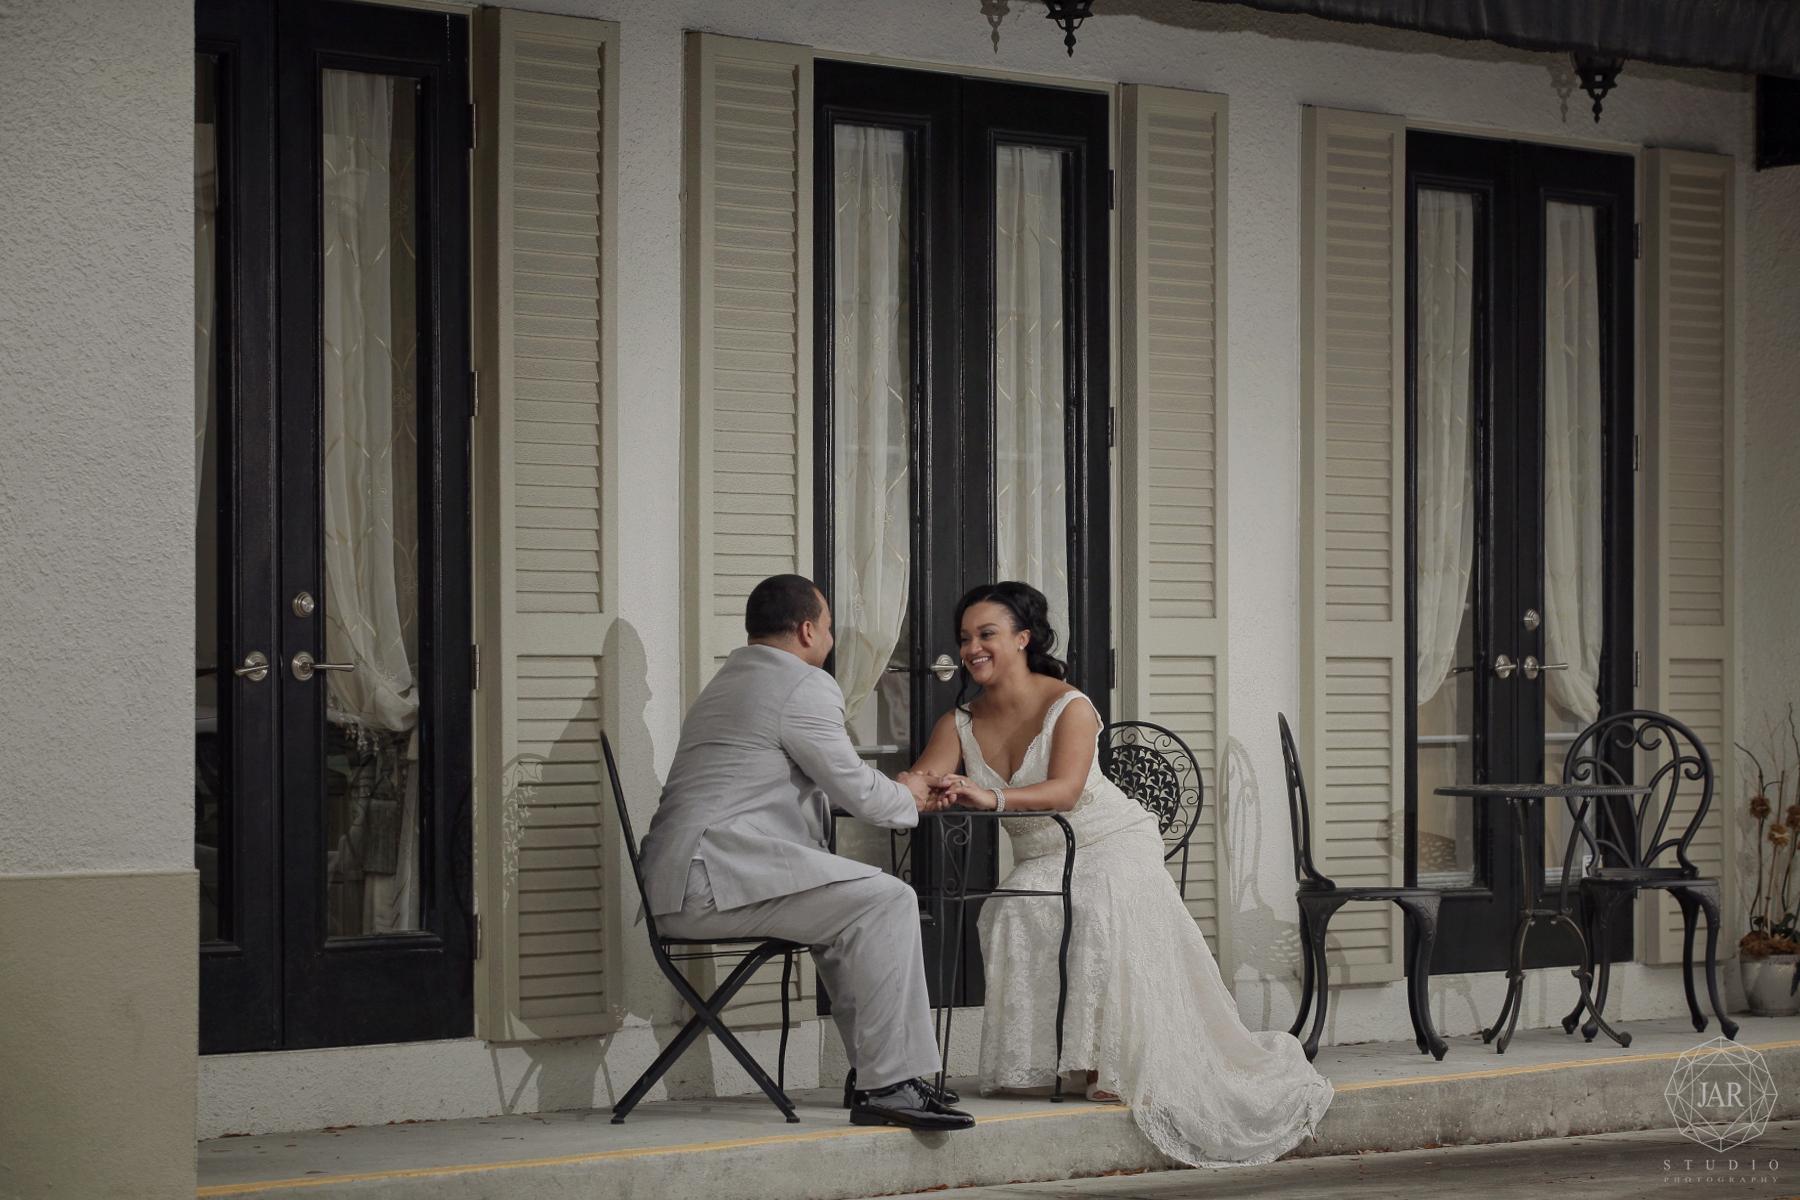 25-real-weddings-at-winter-park-jarstudio-photography.JPG